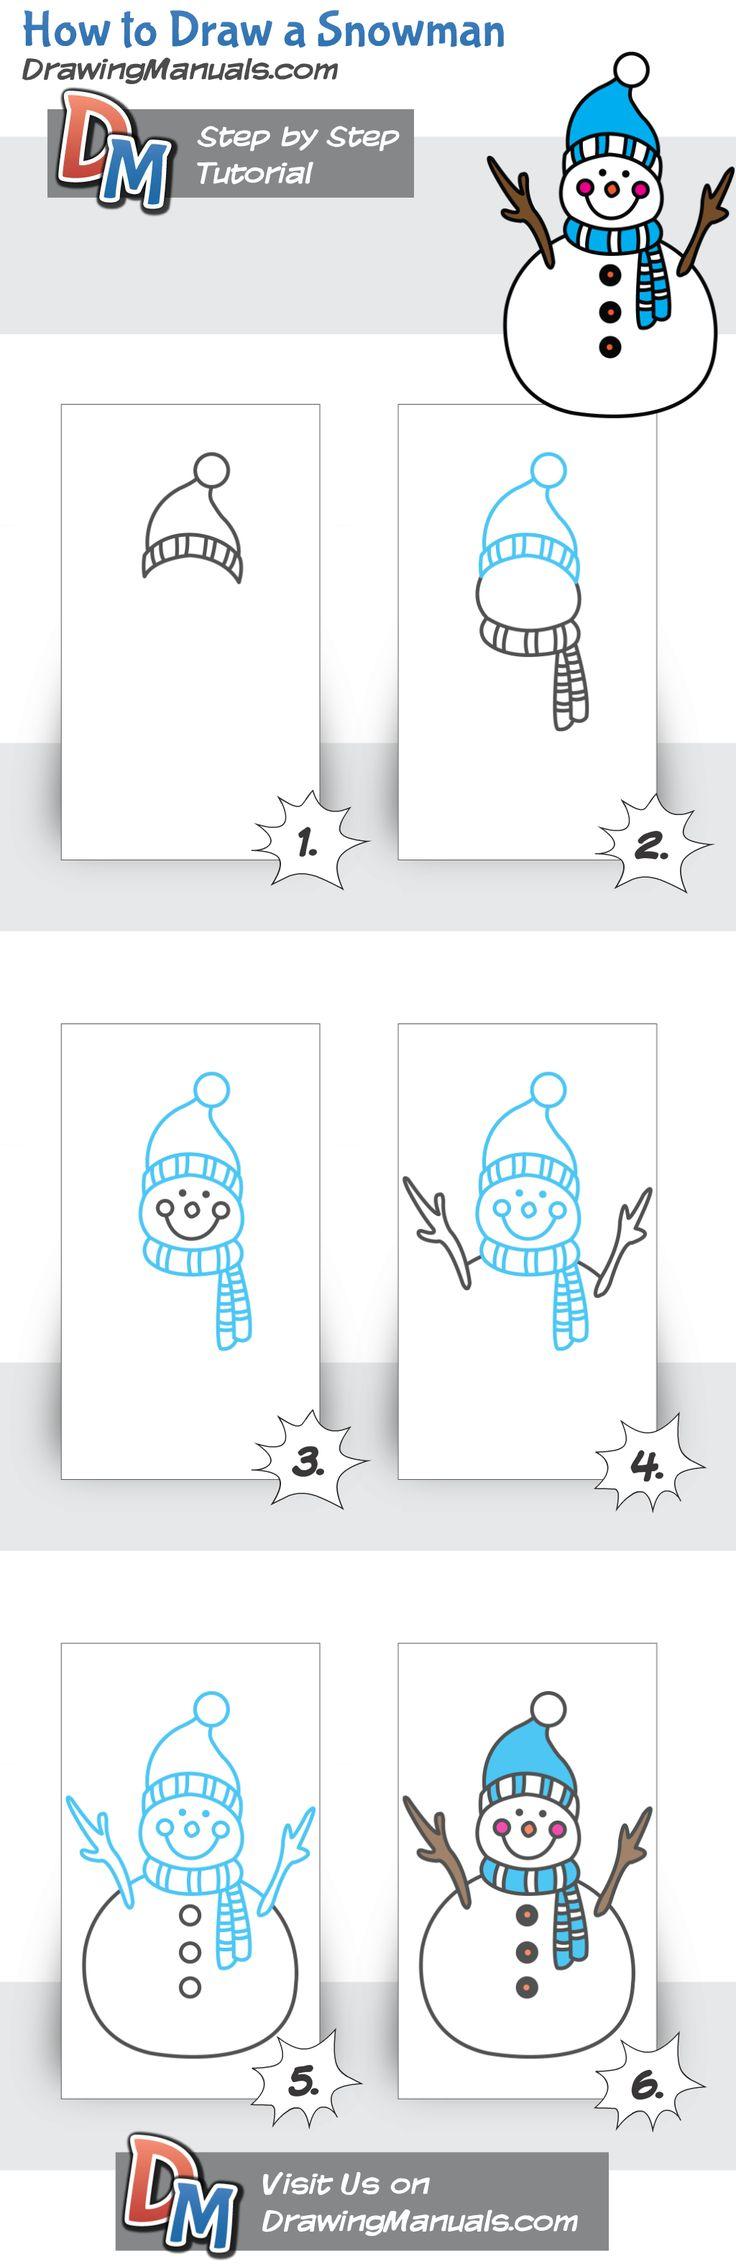 How to Draw a Snowman https://play.google.com/store/apps/details?id=com.aku.drawissimo